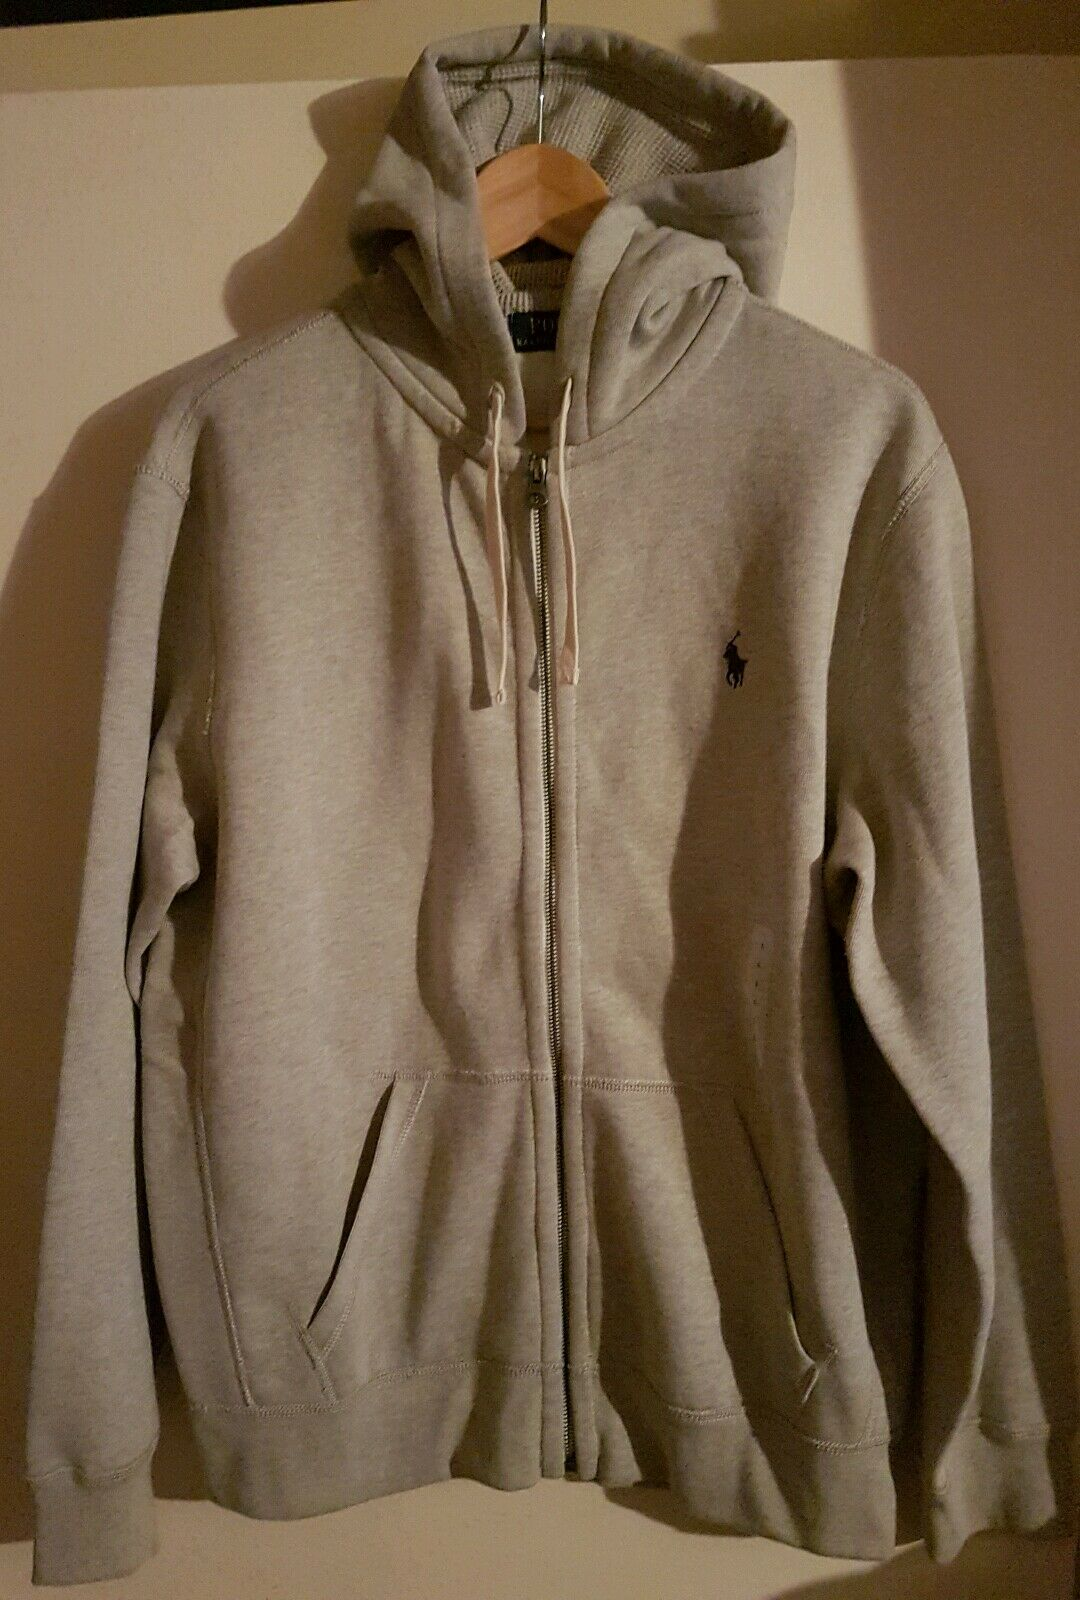 Polo Ralph Lauren herren grau Quality  Hoody Cardigan Top 2XL ONLY  WOW GENUINE